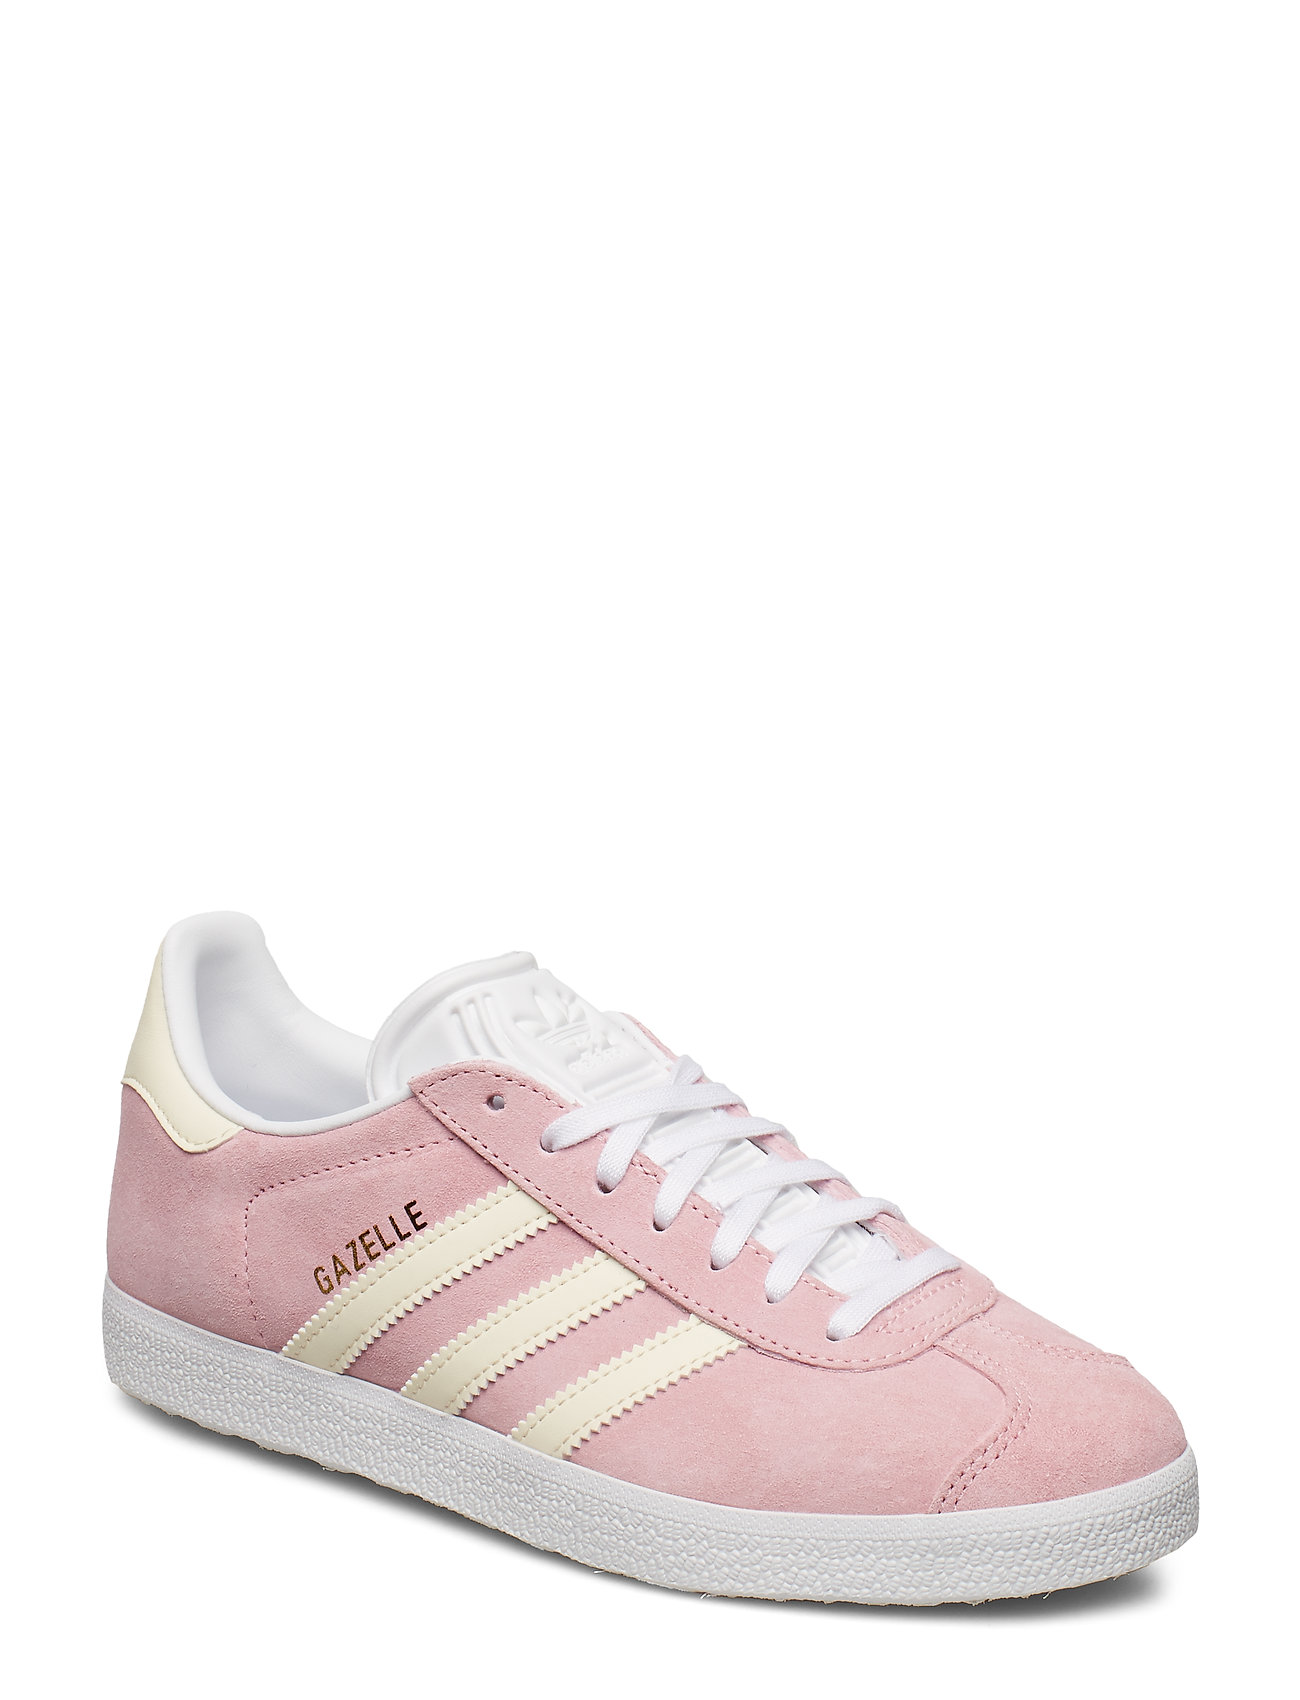 Shop Adidas Gazelle herre sort blå grå sko online butik